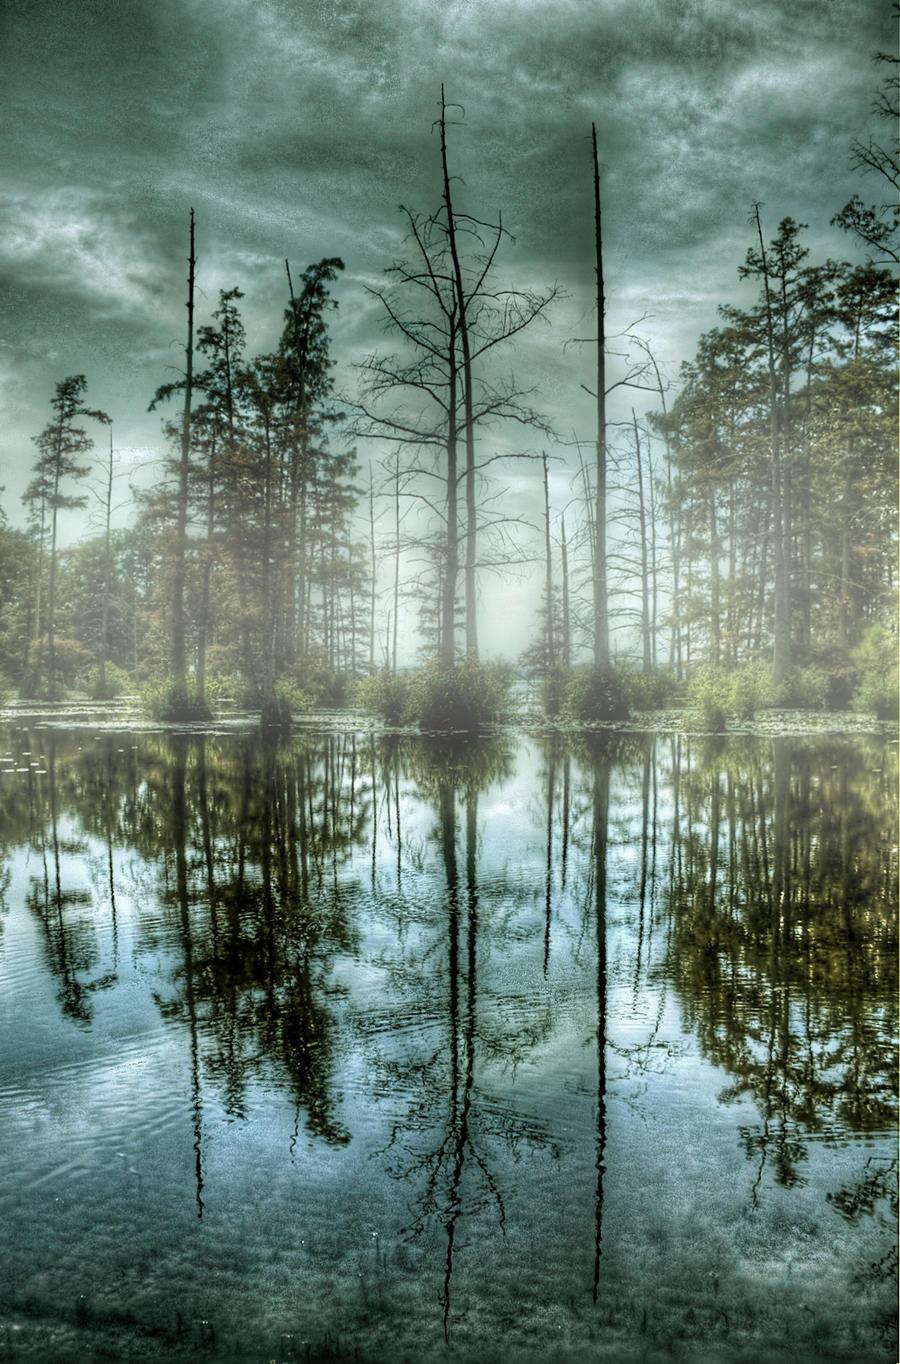 Foggy Lake by joelht74